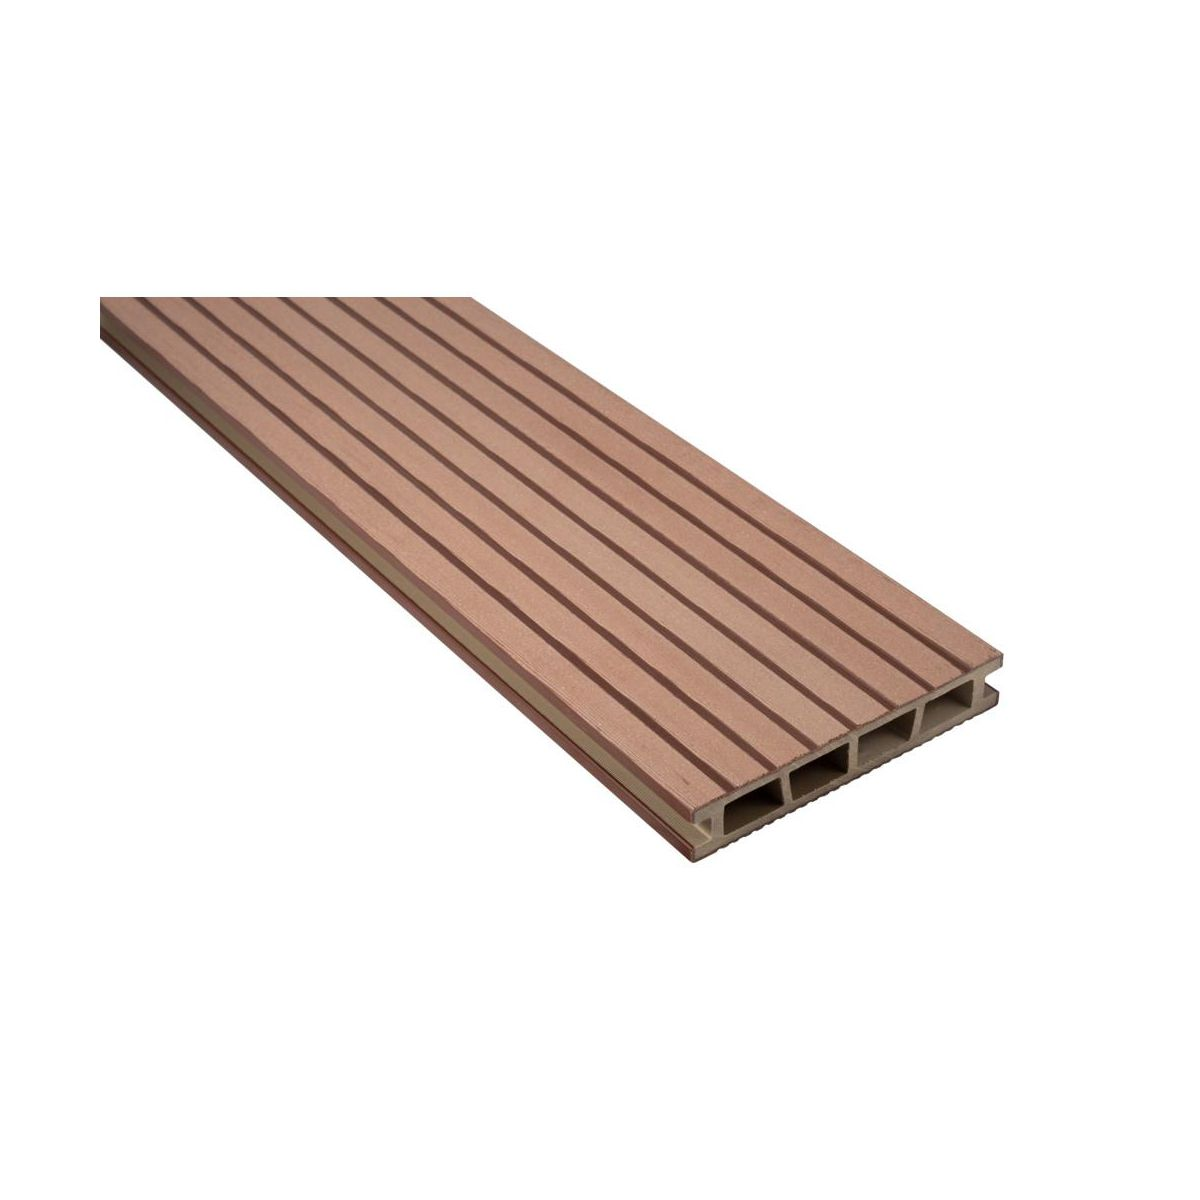 Deska Kompozytowa 240 X 15 Cm 25 Mm Gala Redwood Dlh